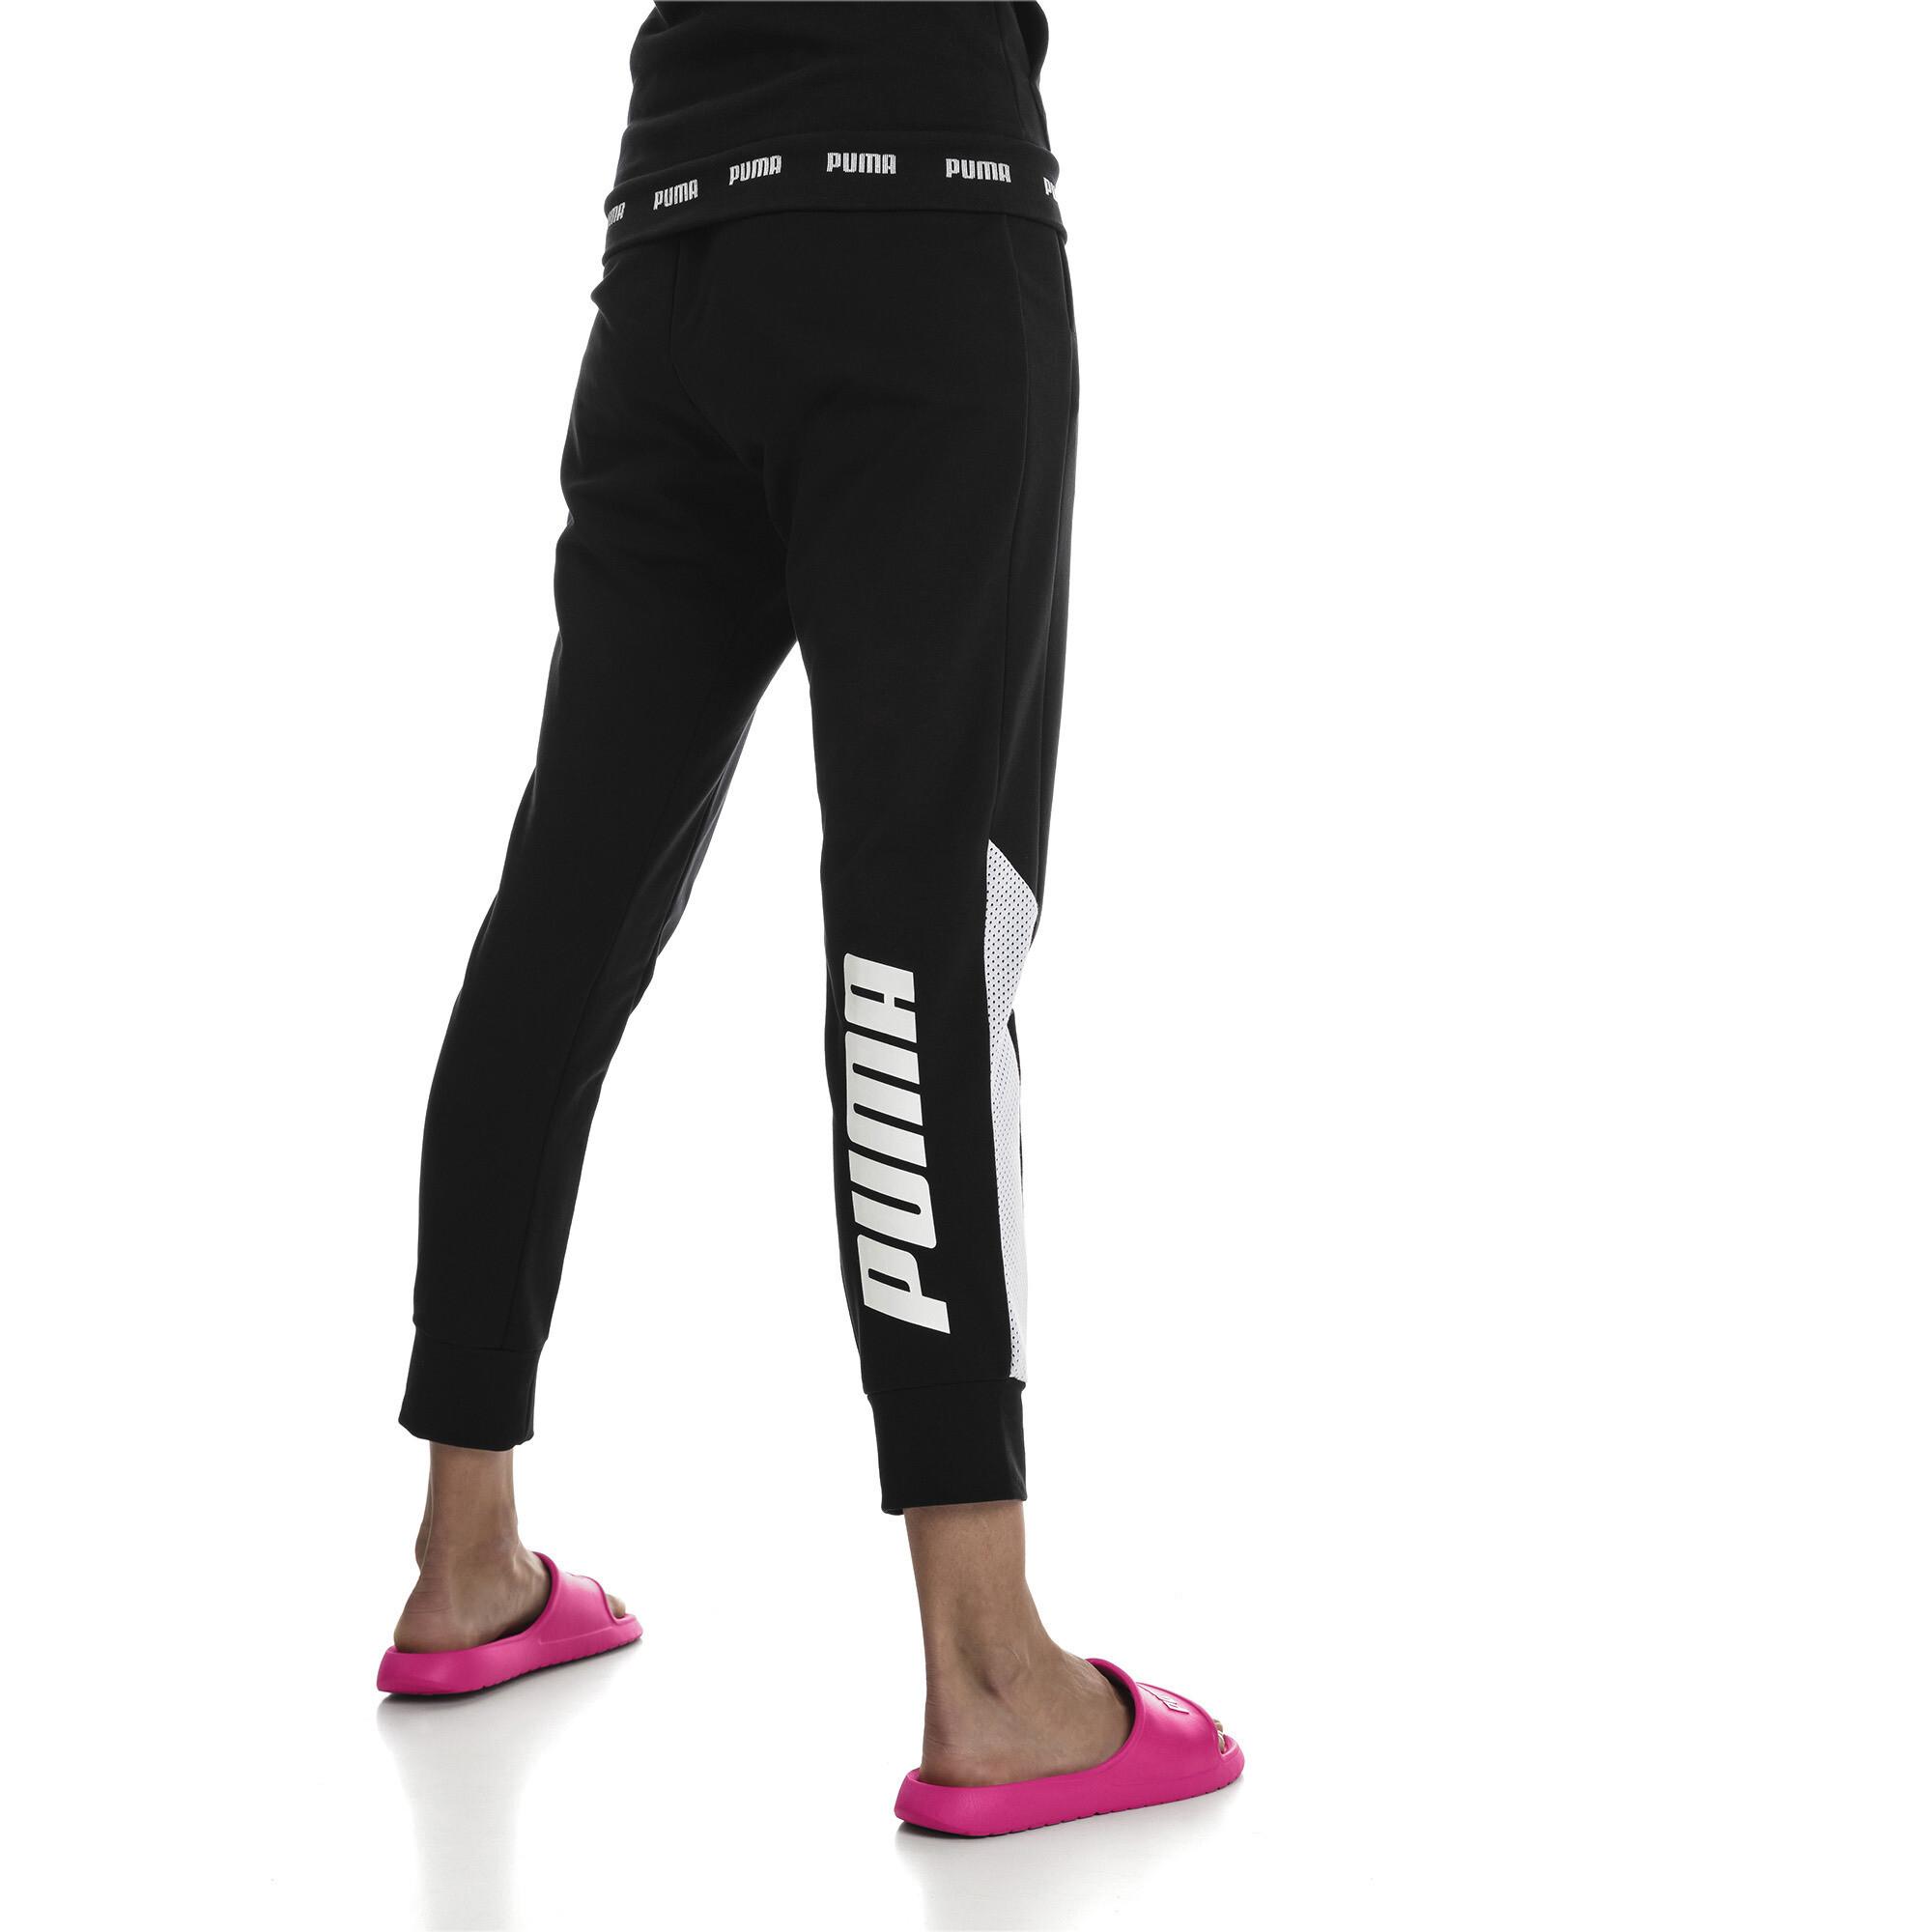 PUMA-Modern-Sports-Pants-Women-Knitted-Pants-Basics thumbnail 5